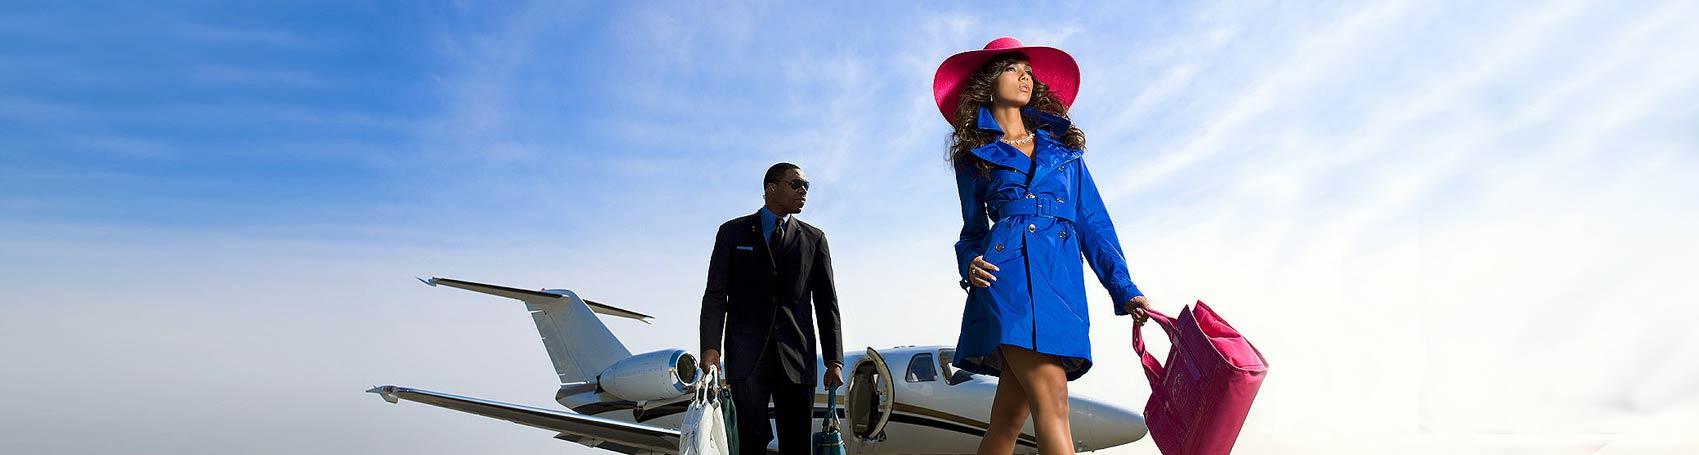 Servicios de concierge VIP en Ibiza. Reserva mesas VIP beach club, chofer, seguridad privada, servicios VIP. Consulting Services Ibiza